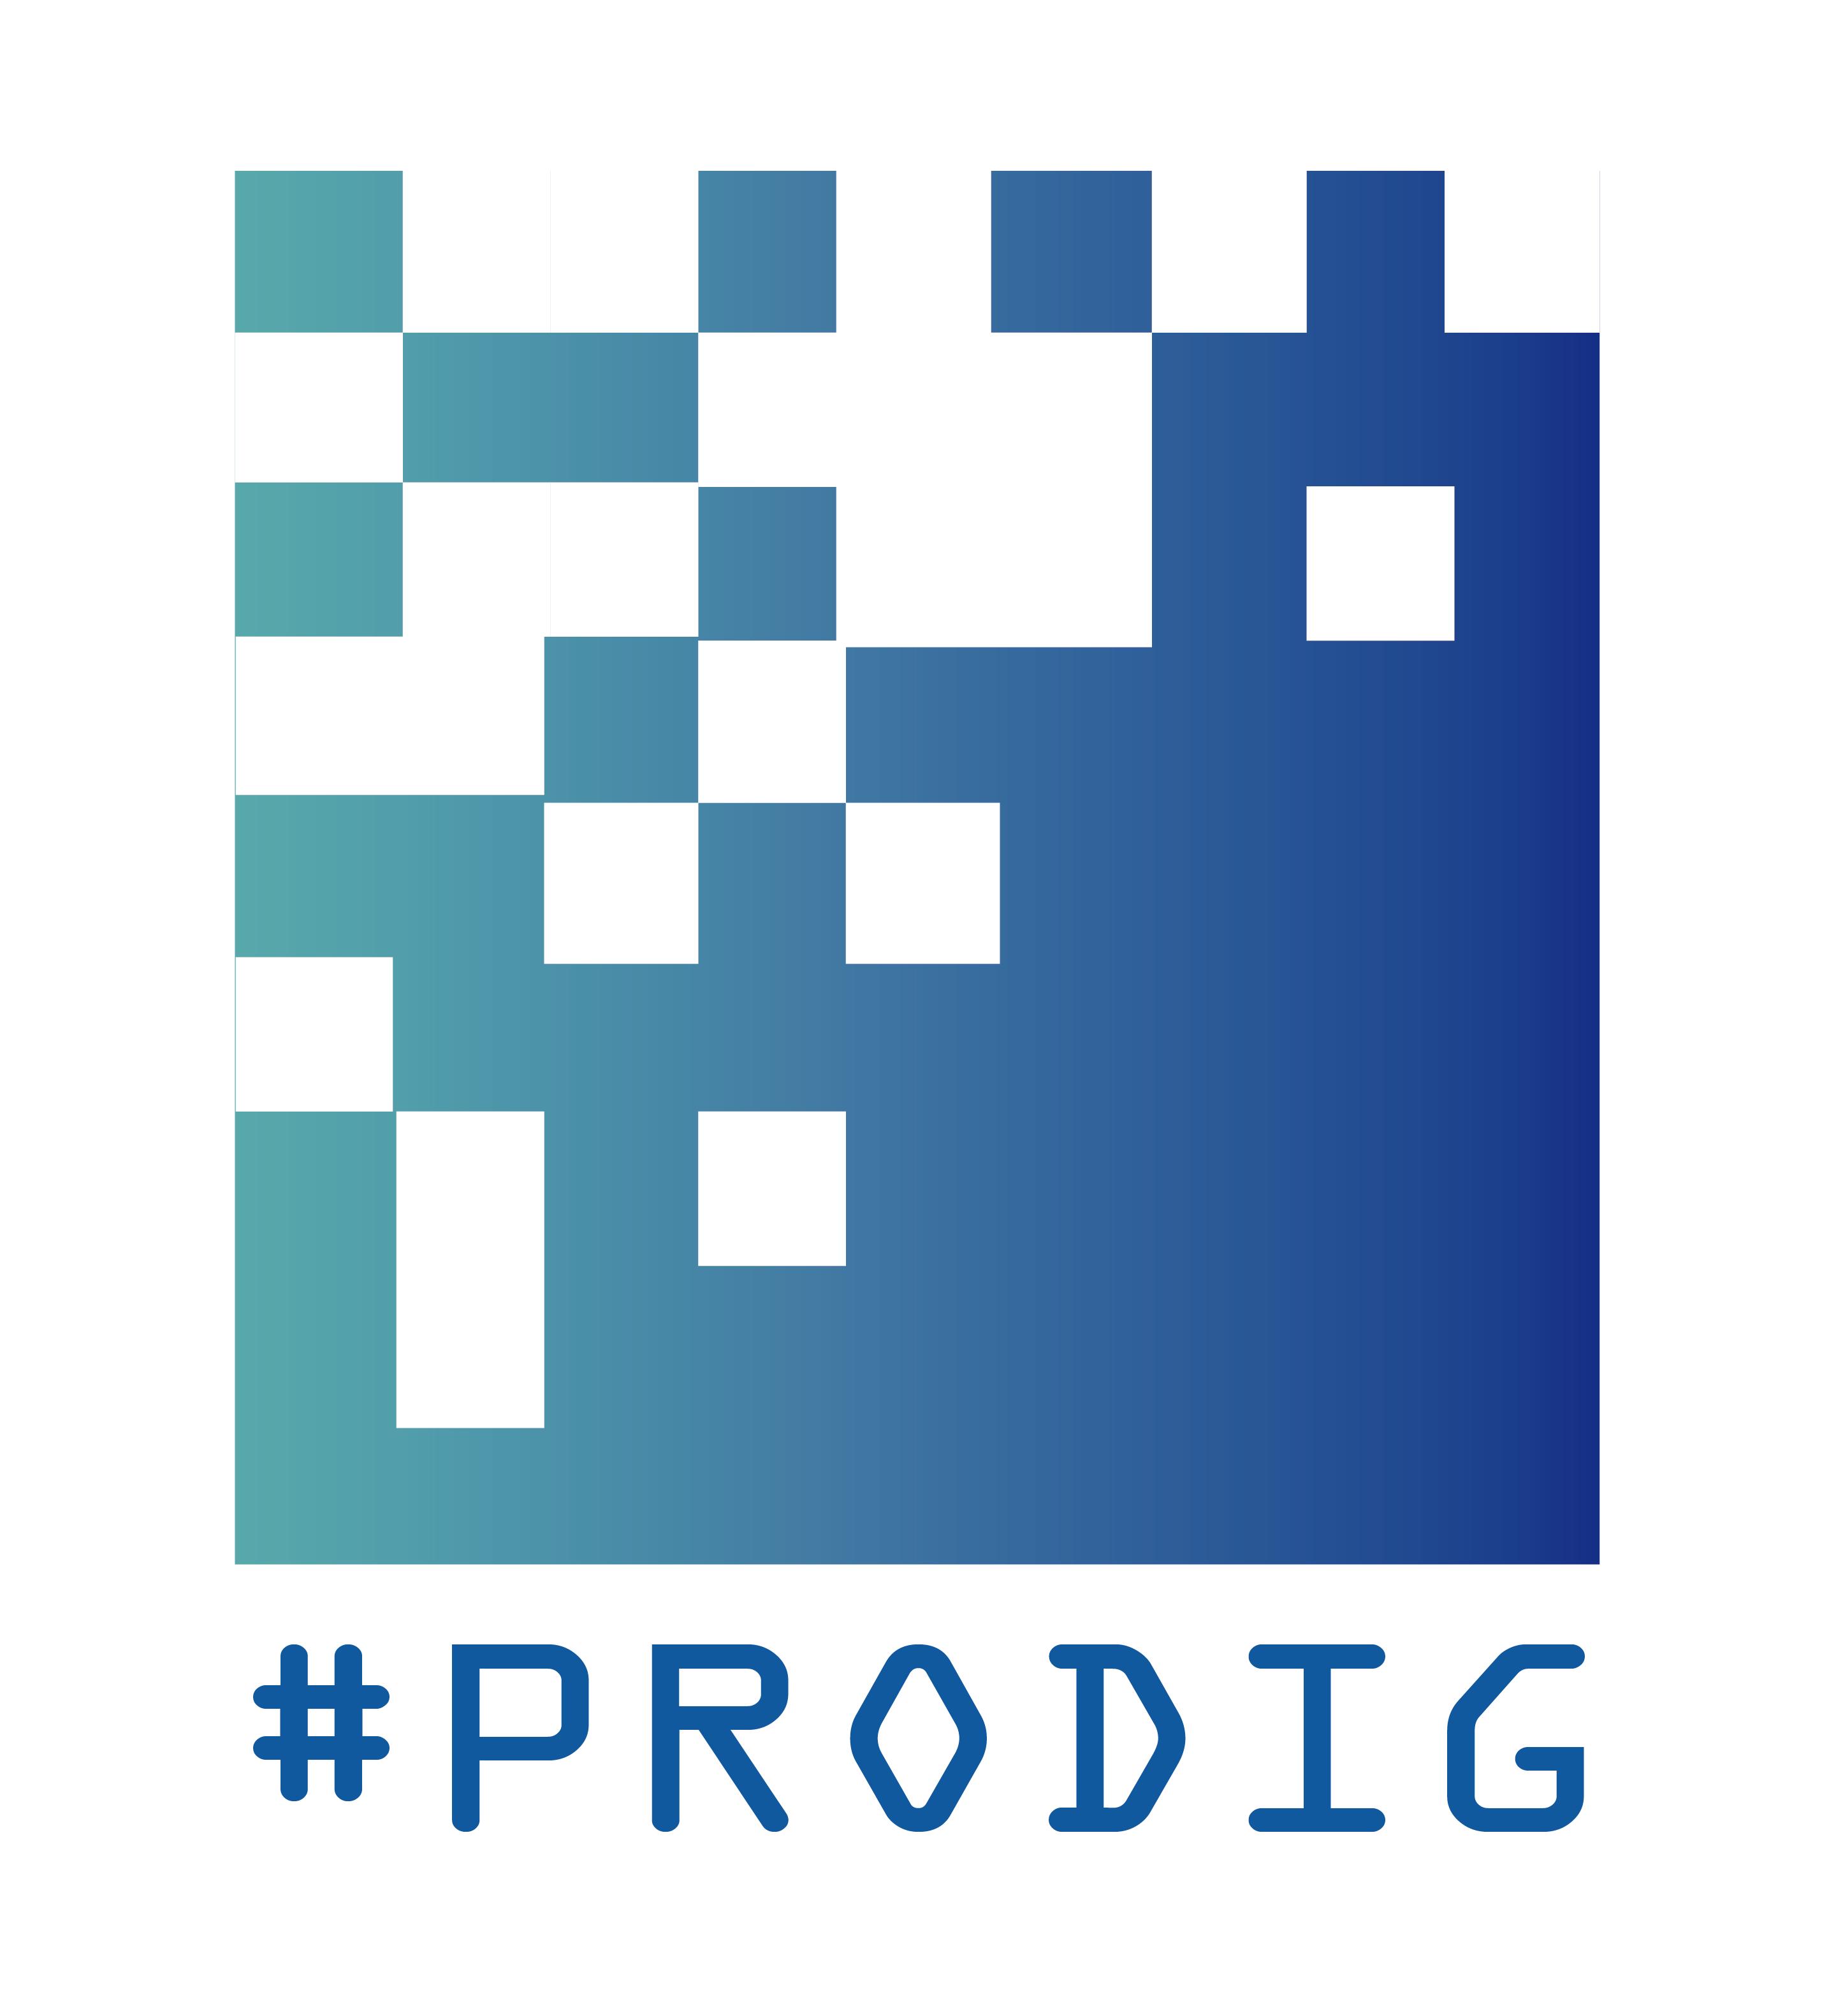 Inicio #PRODIG